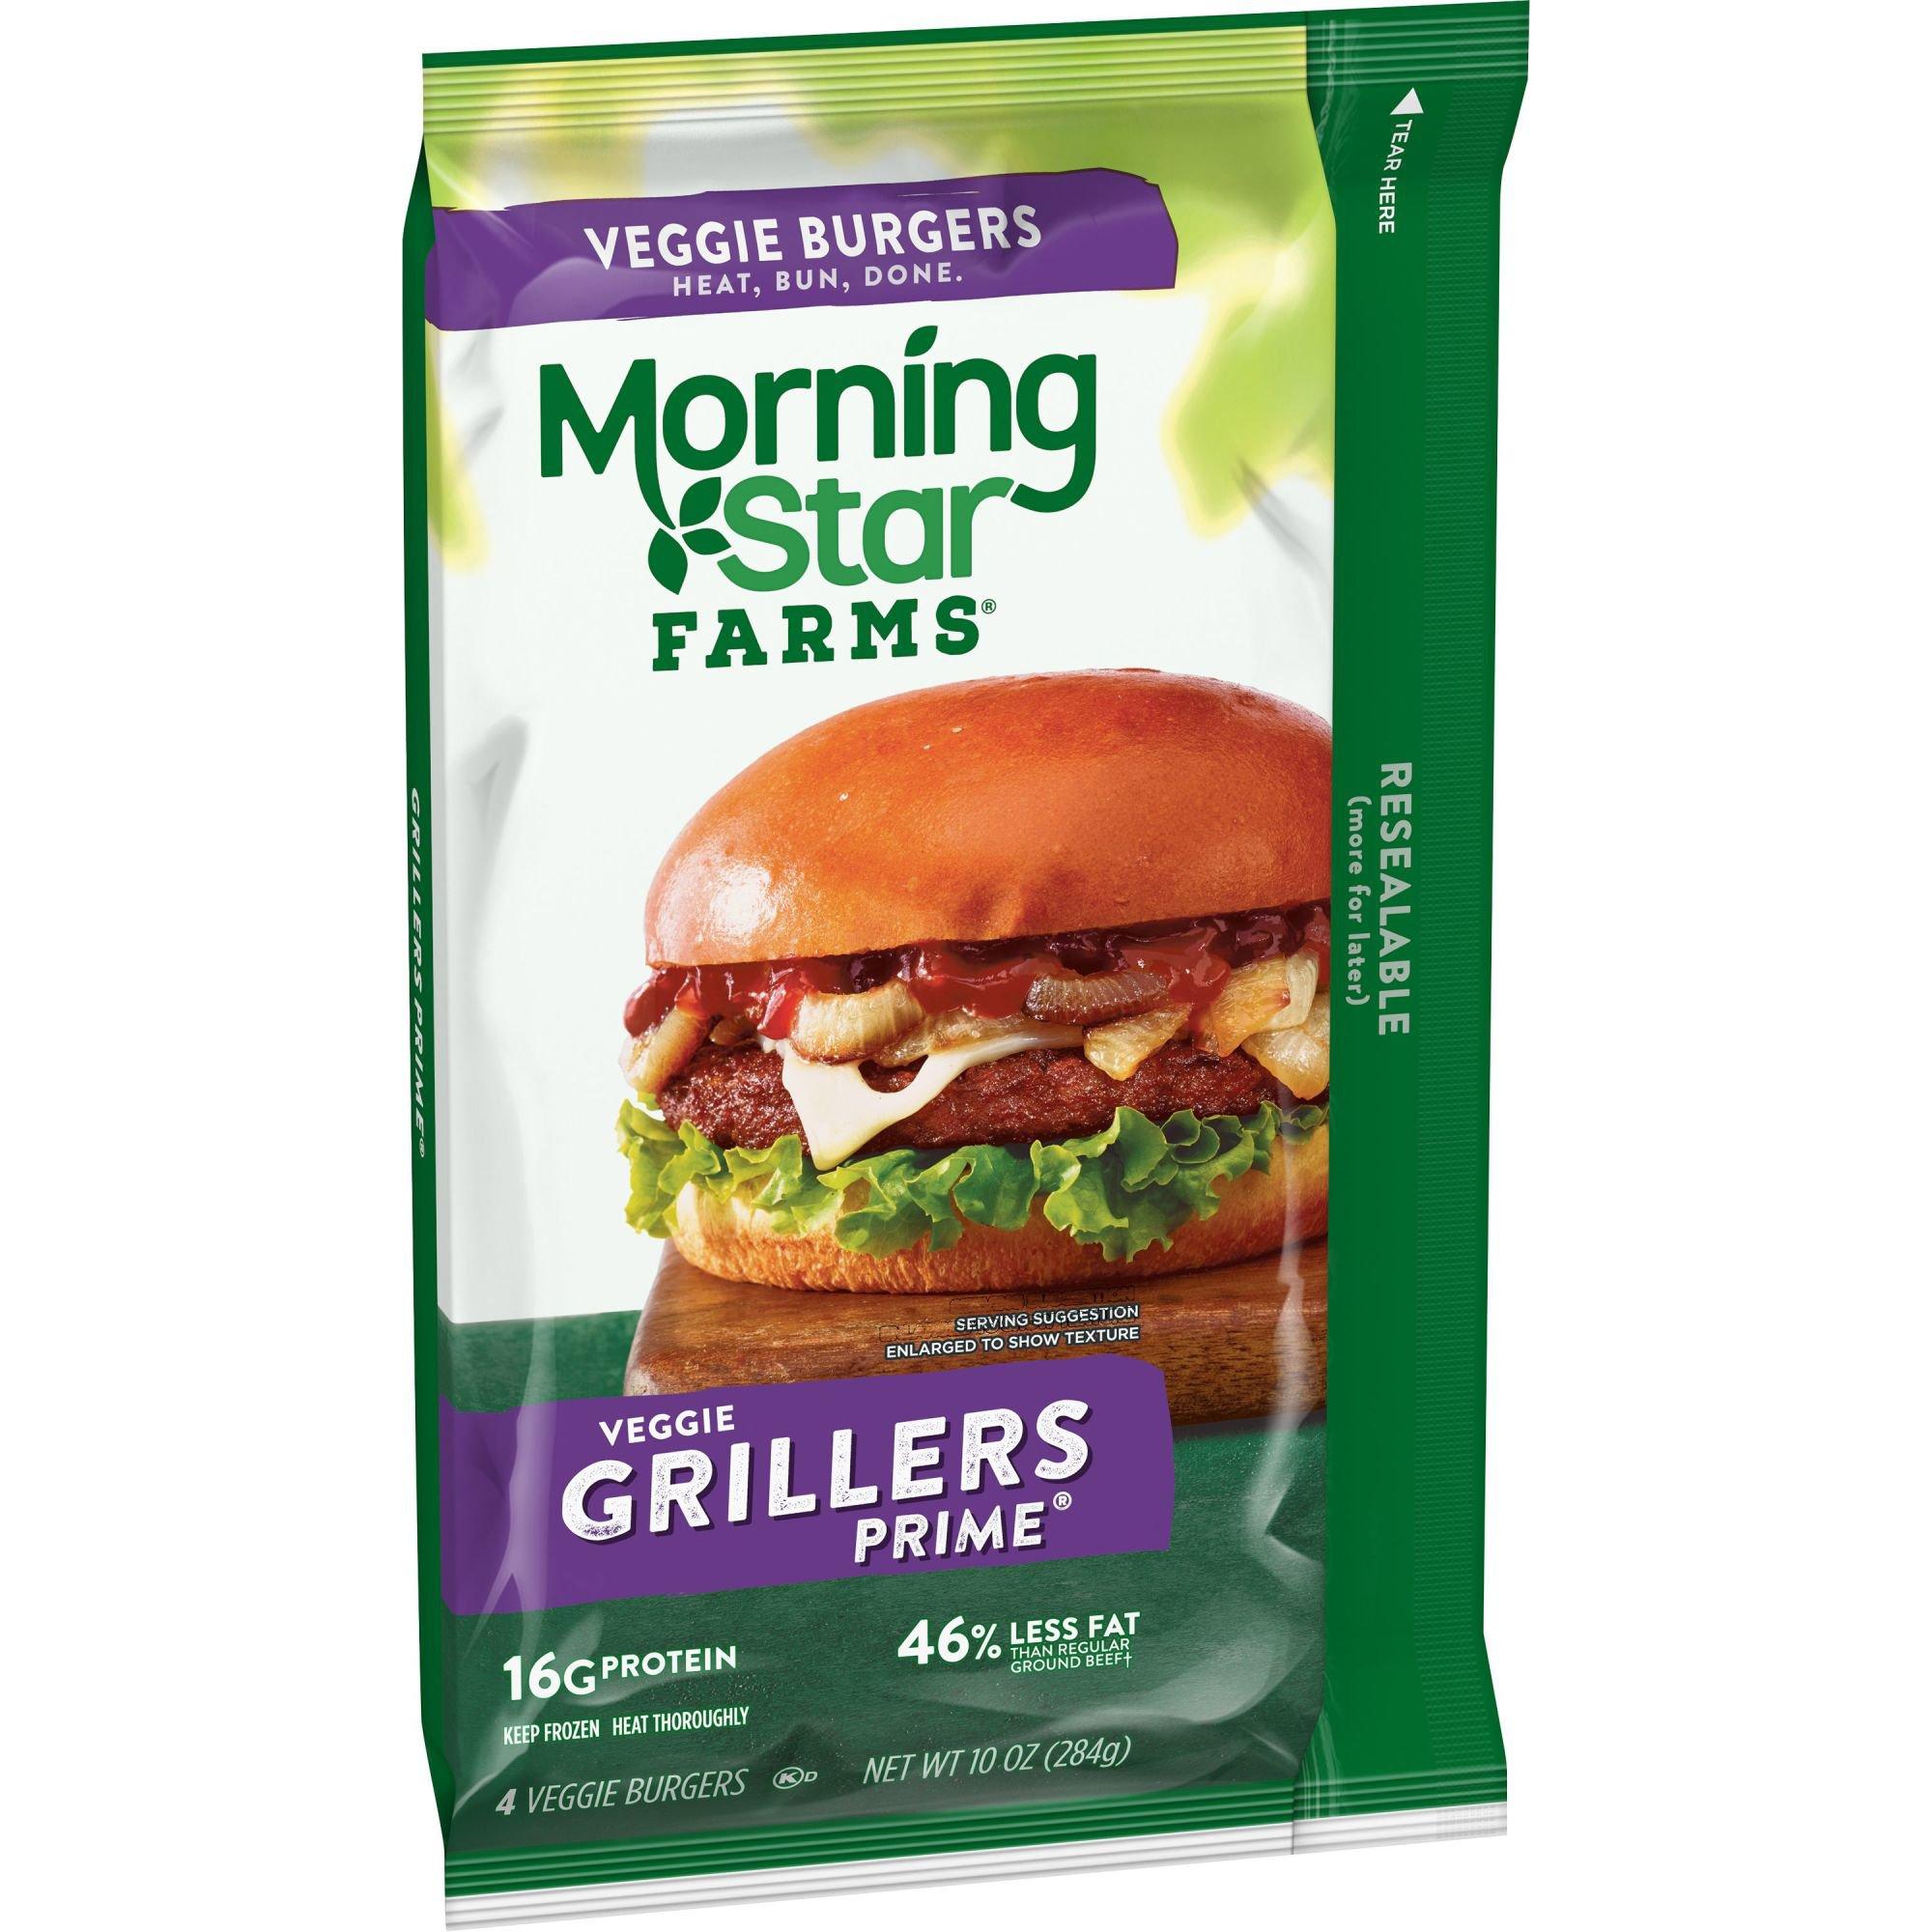 Morningstar Farms Grillers Prime Veggie Burgers Shop Meat Alternatives At H E B